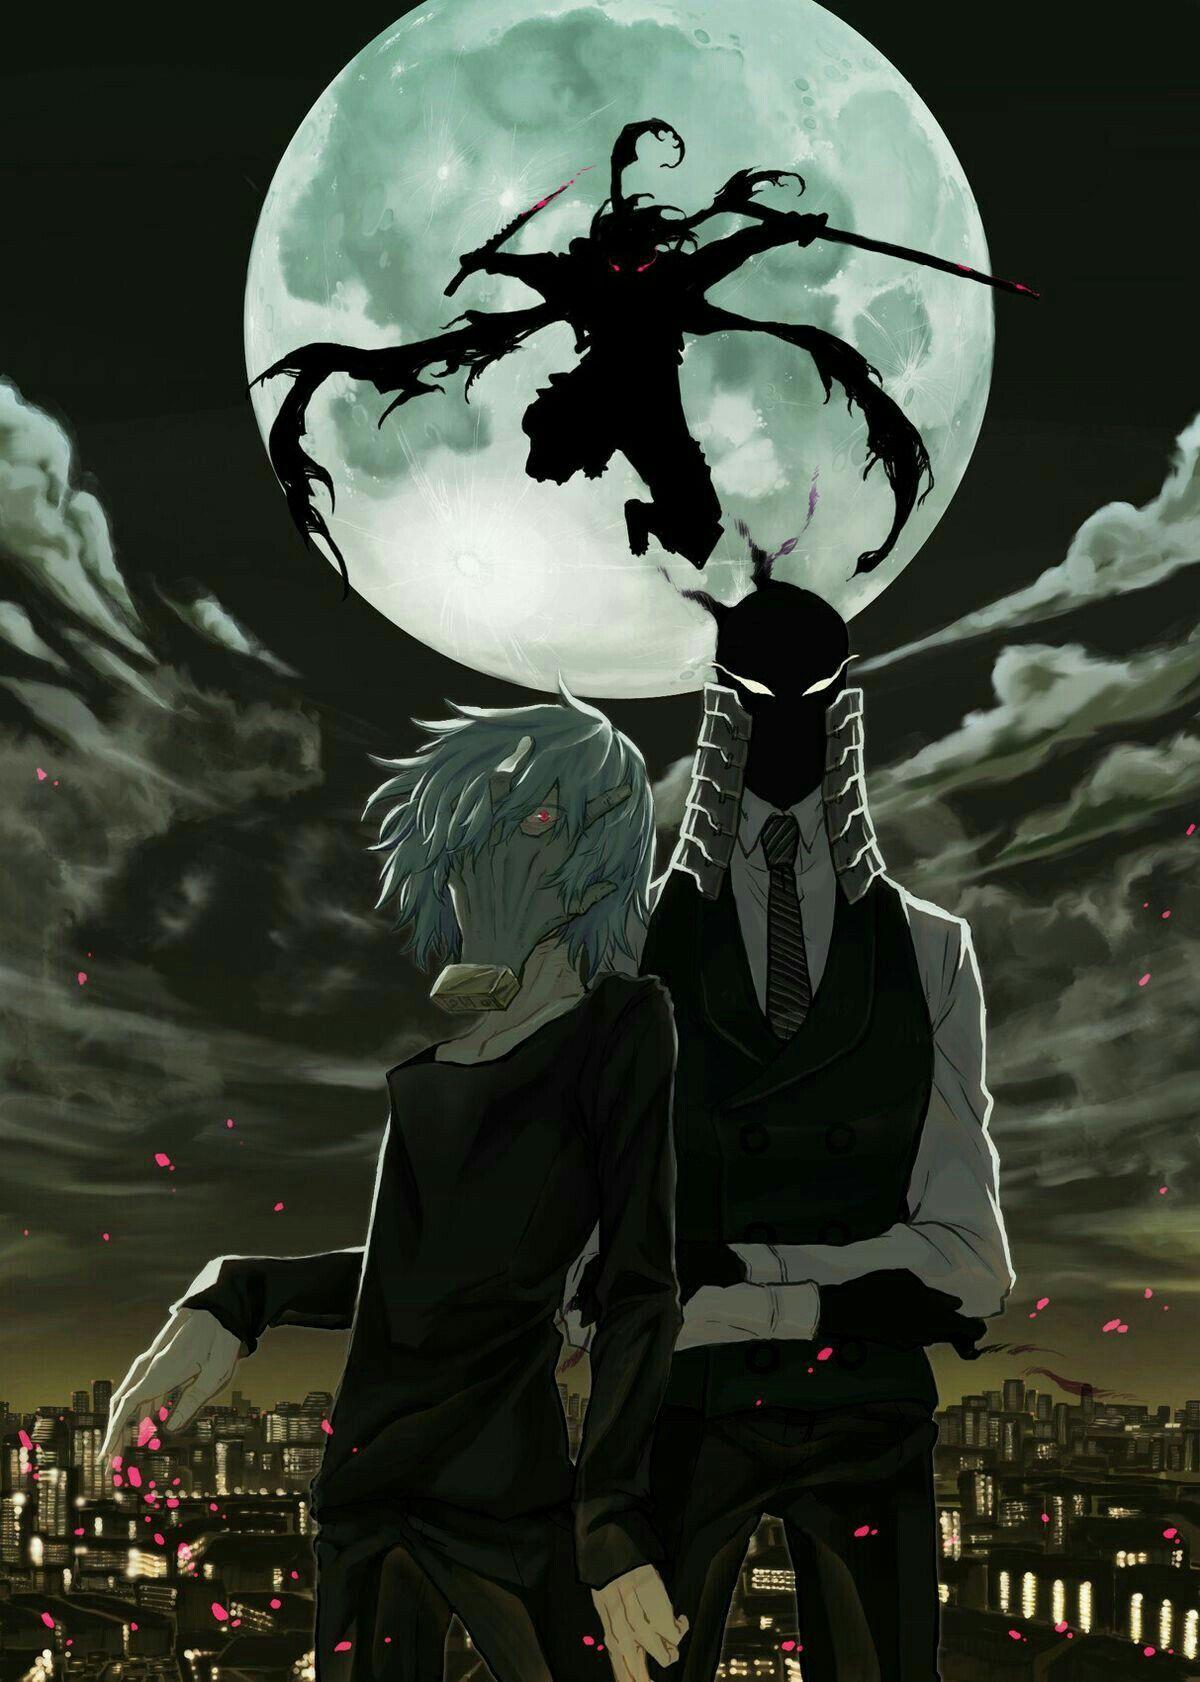 Shiragaki Mha Bnha Myheroacademia Bokunoheroacademia Anime Hero Wallpaper My Hero